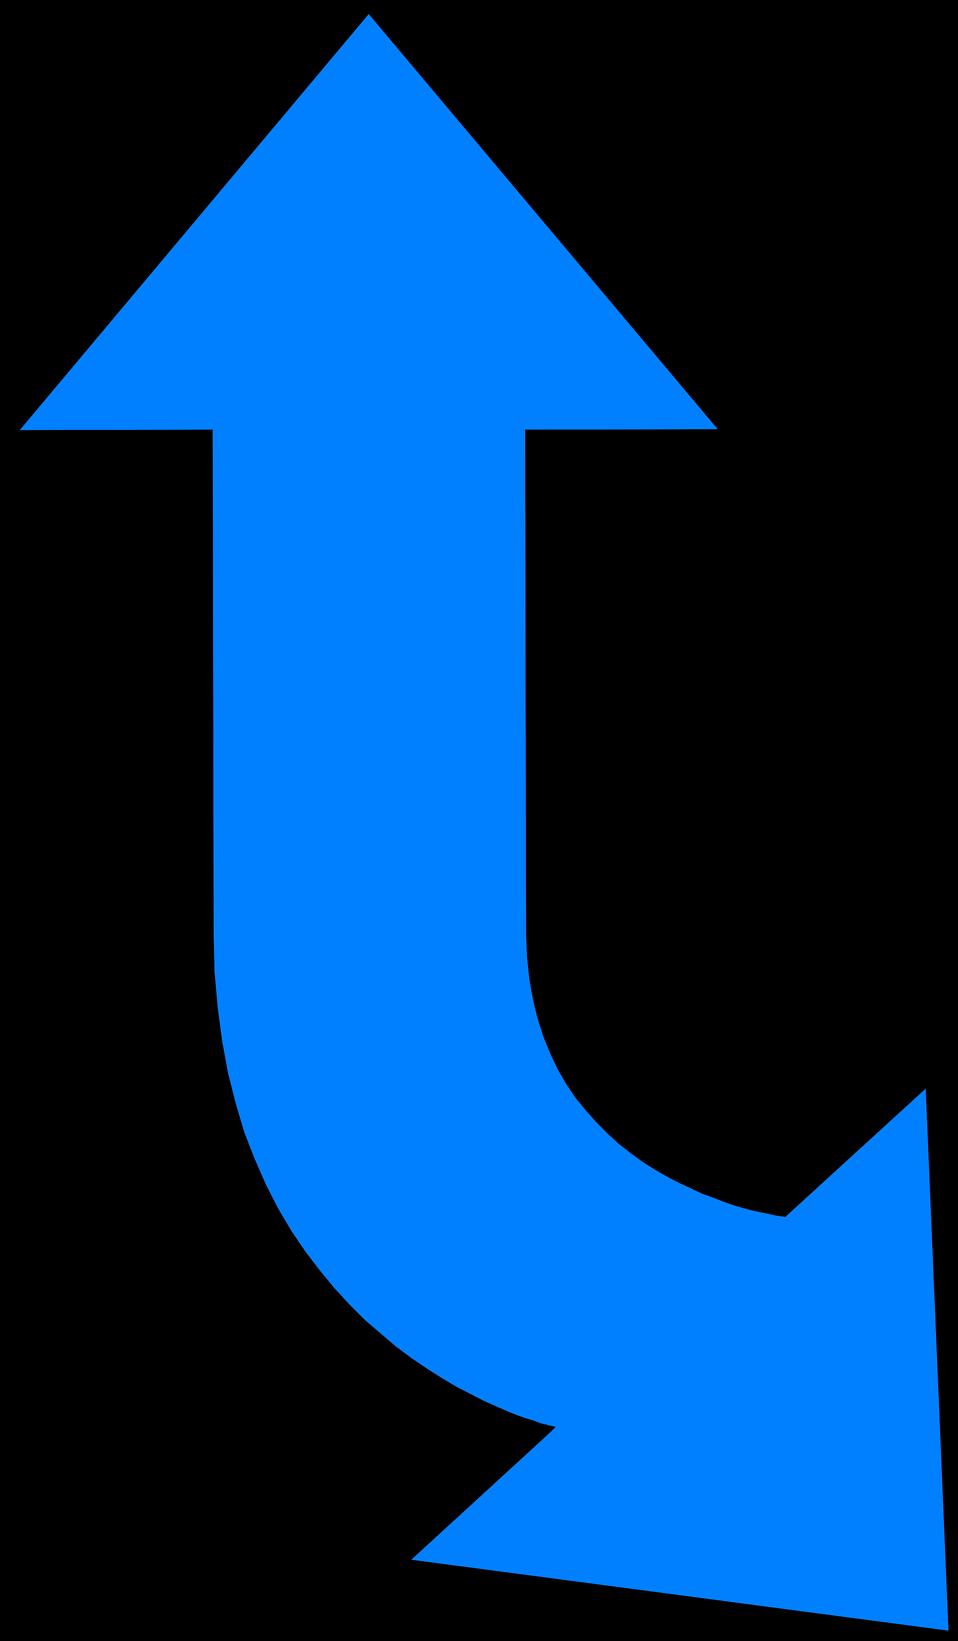 Up clipart arrow. Arrows blue free stock